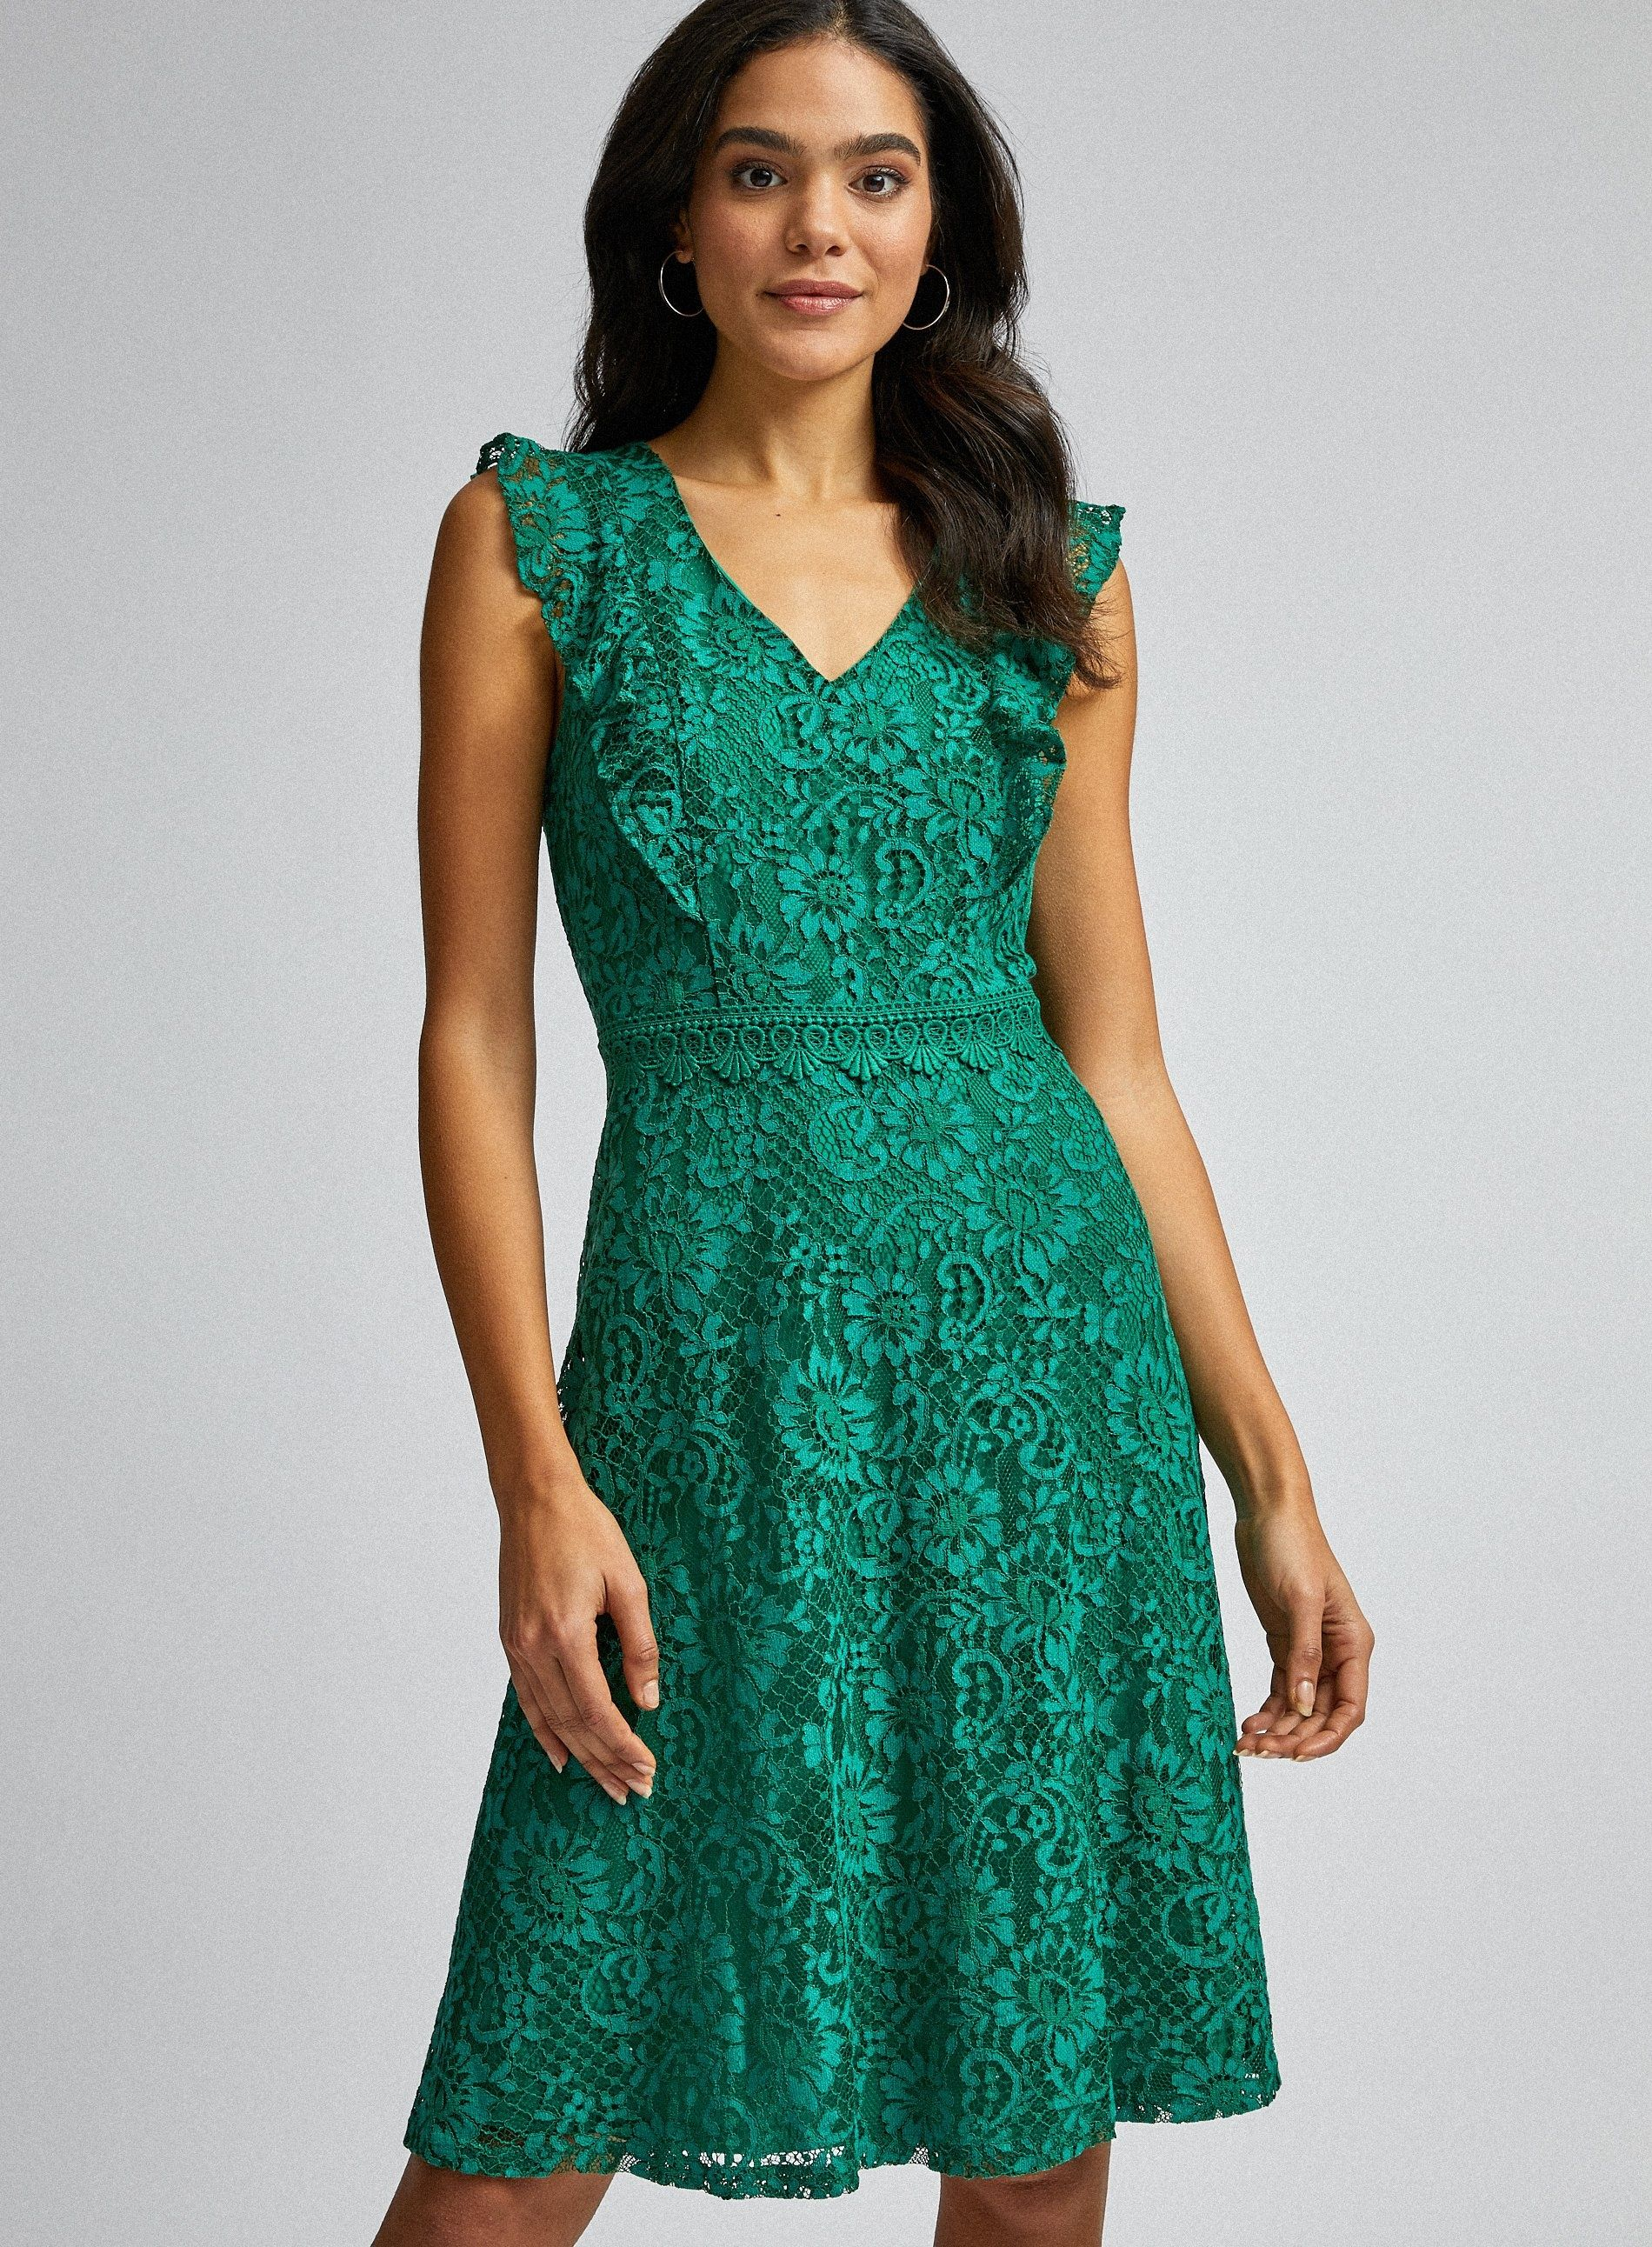 Dorothy Perkins Womens Green Lace Taylor Midi Dress V-Neck Short Sleeve